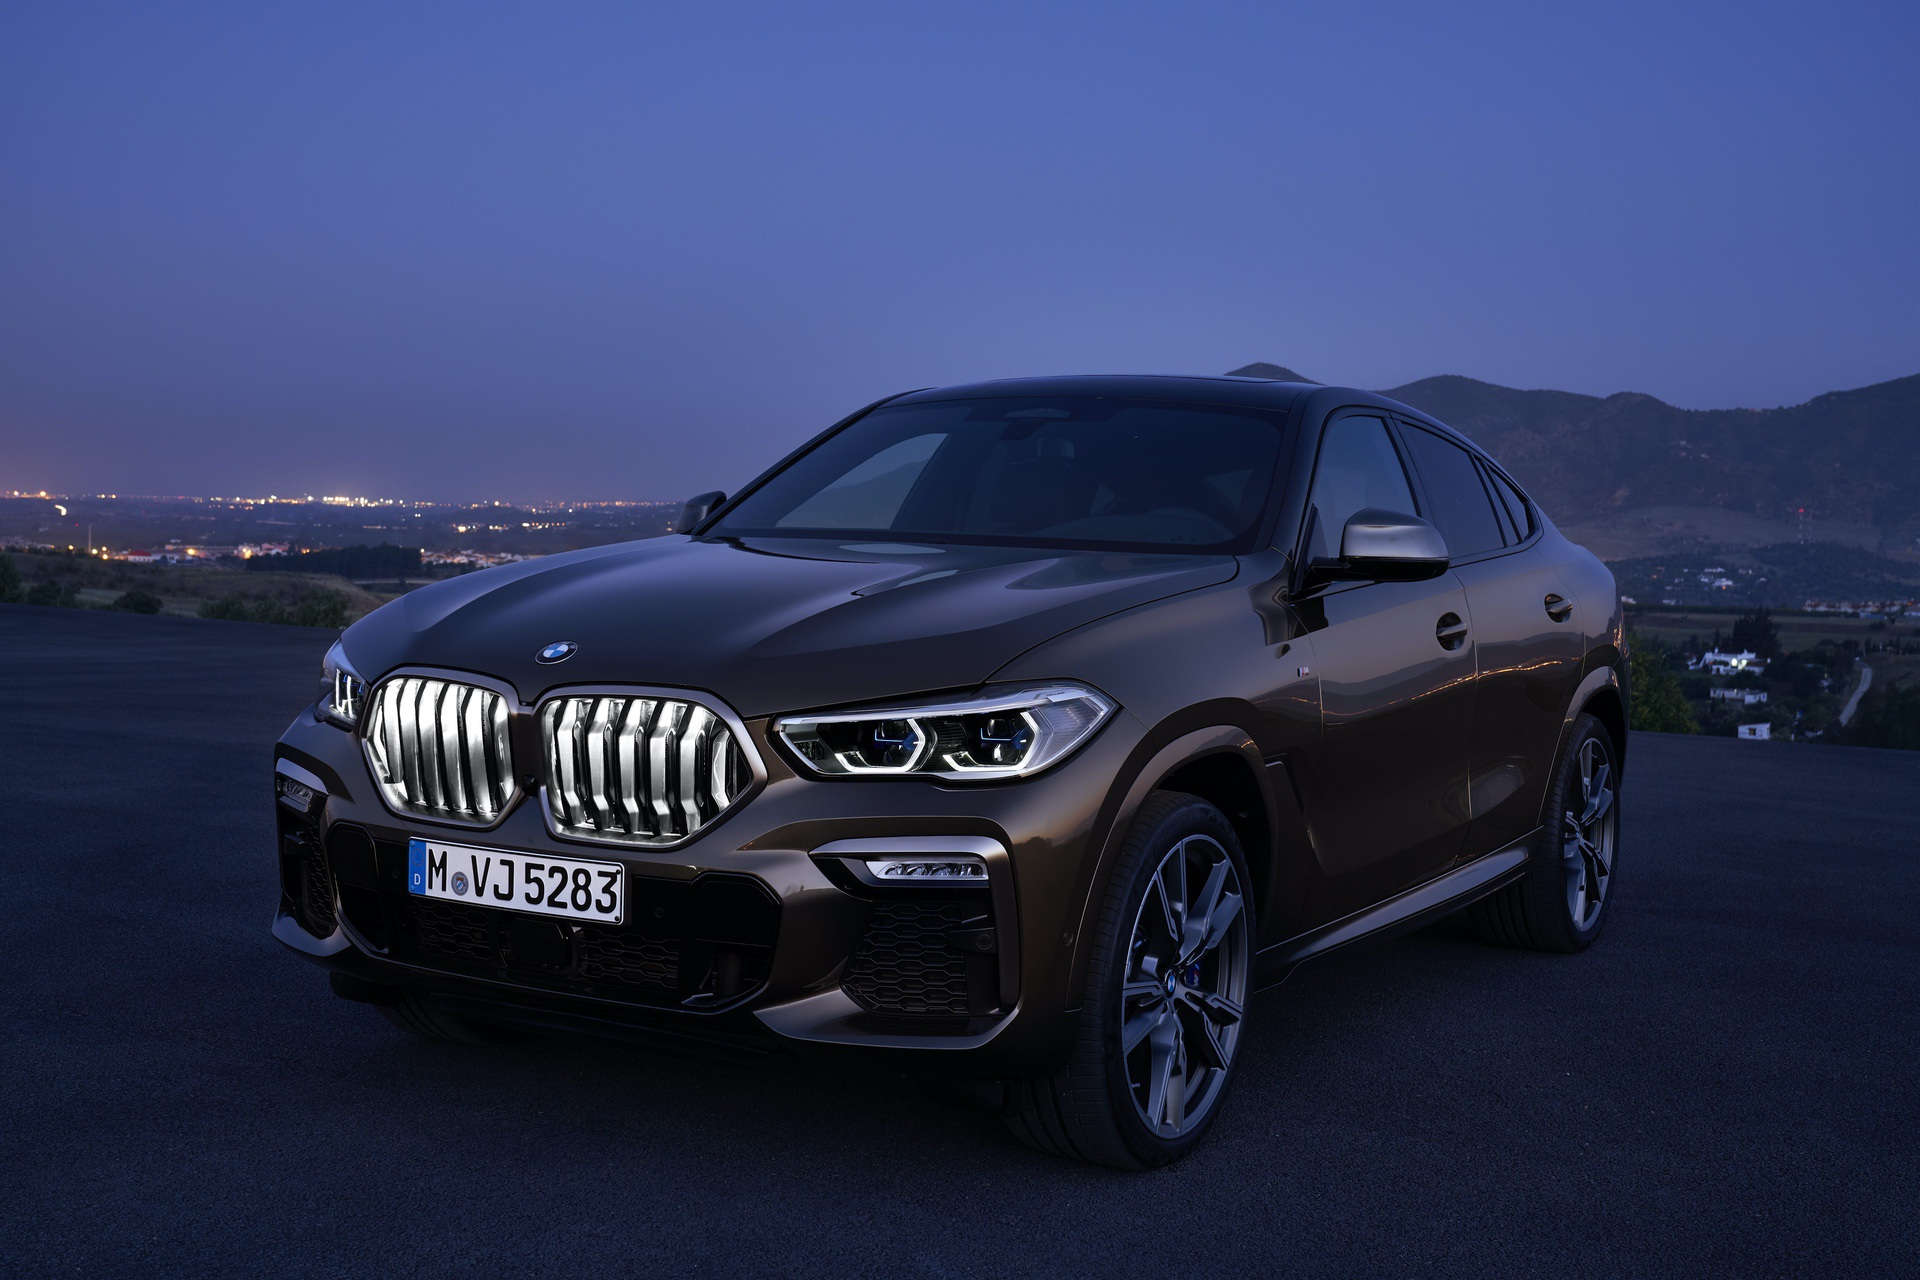 BMW 5 Series will also get an illuminated Kidney Grille